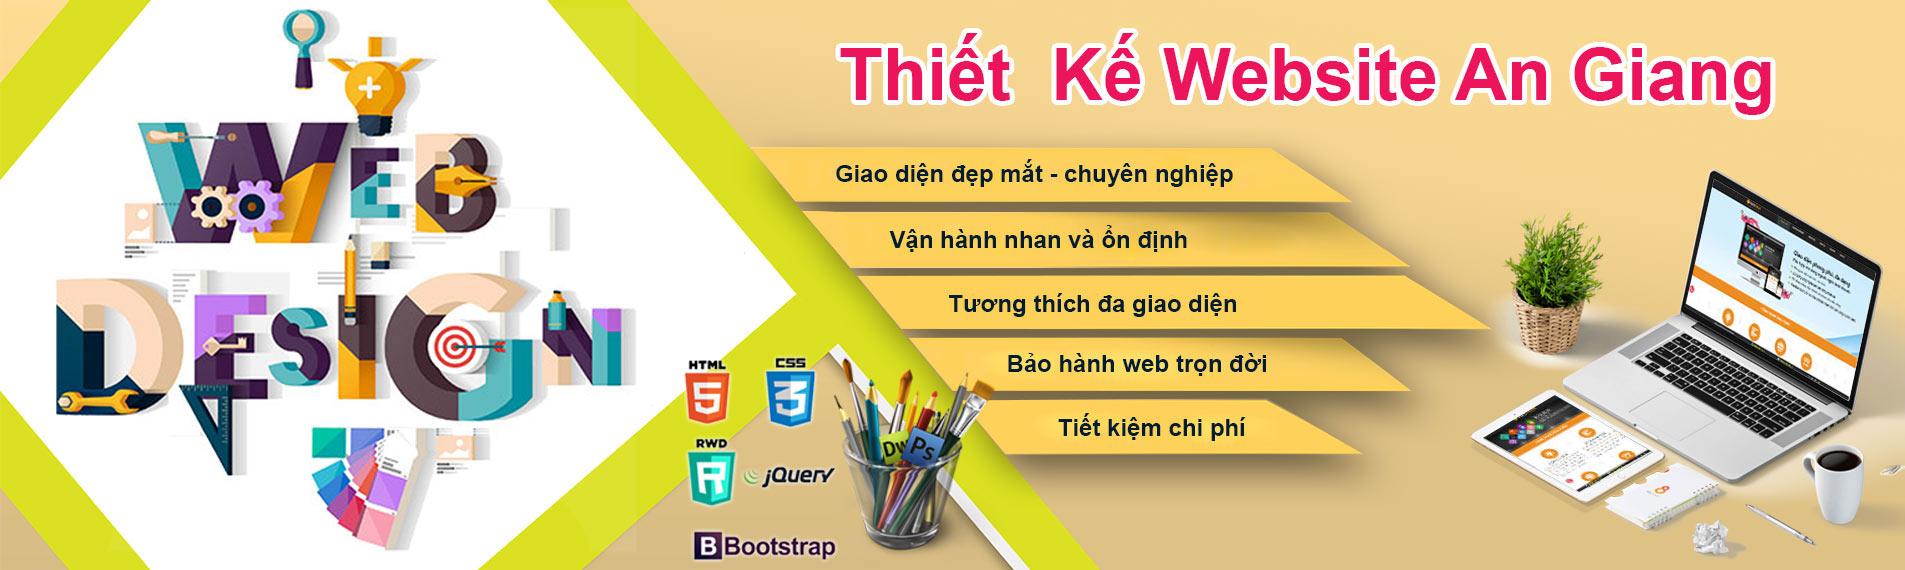 Thiết kế web an giang